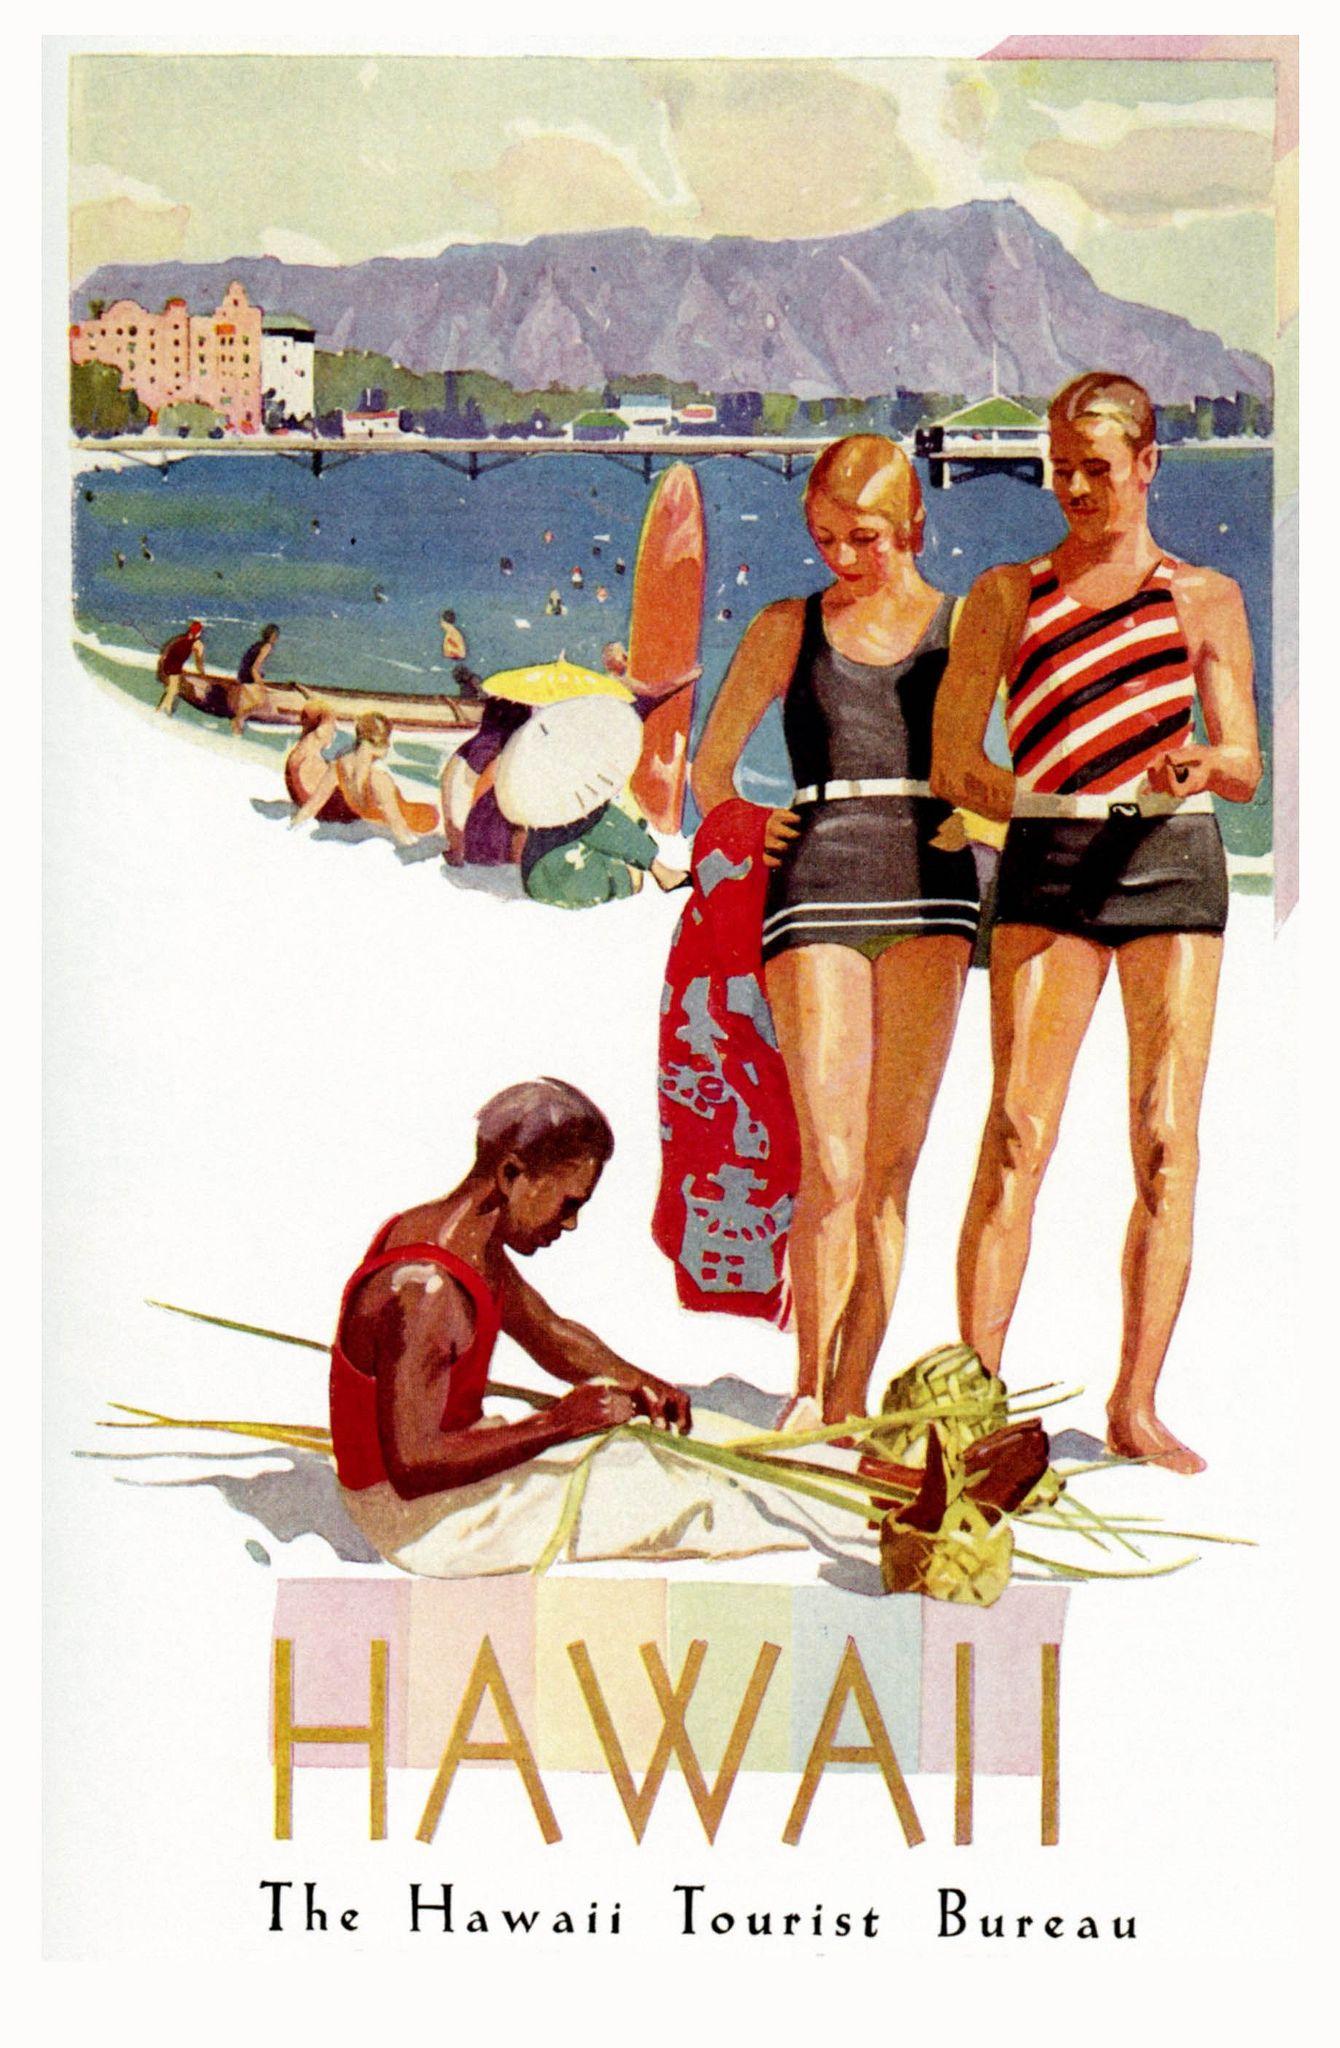 Vintage Illustrated Travel Poster PRINT Hawaii Aloha surfing